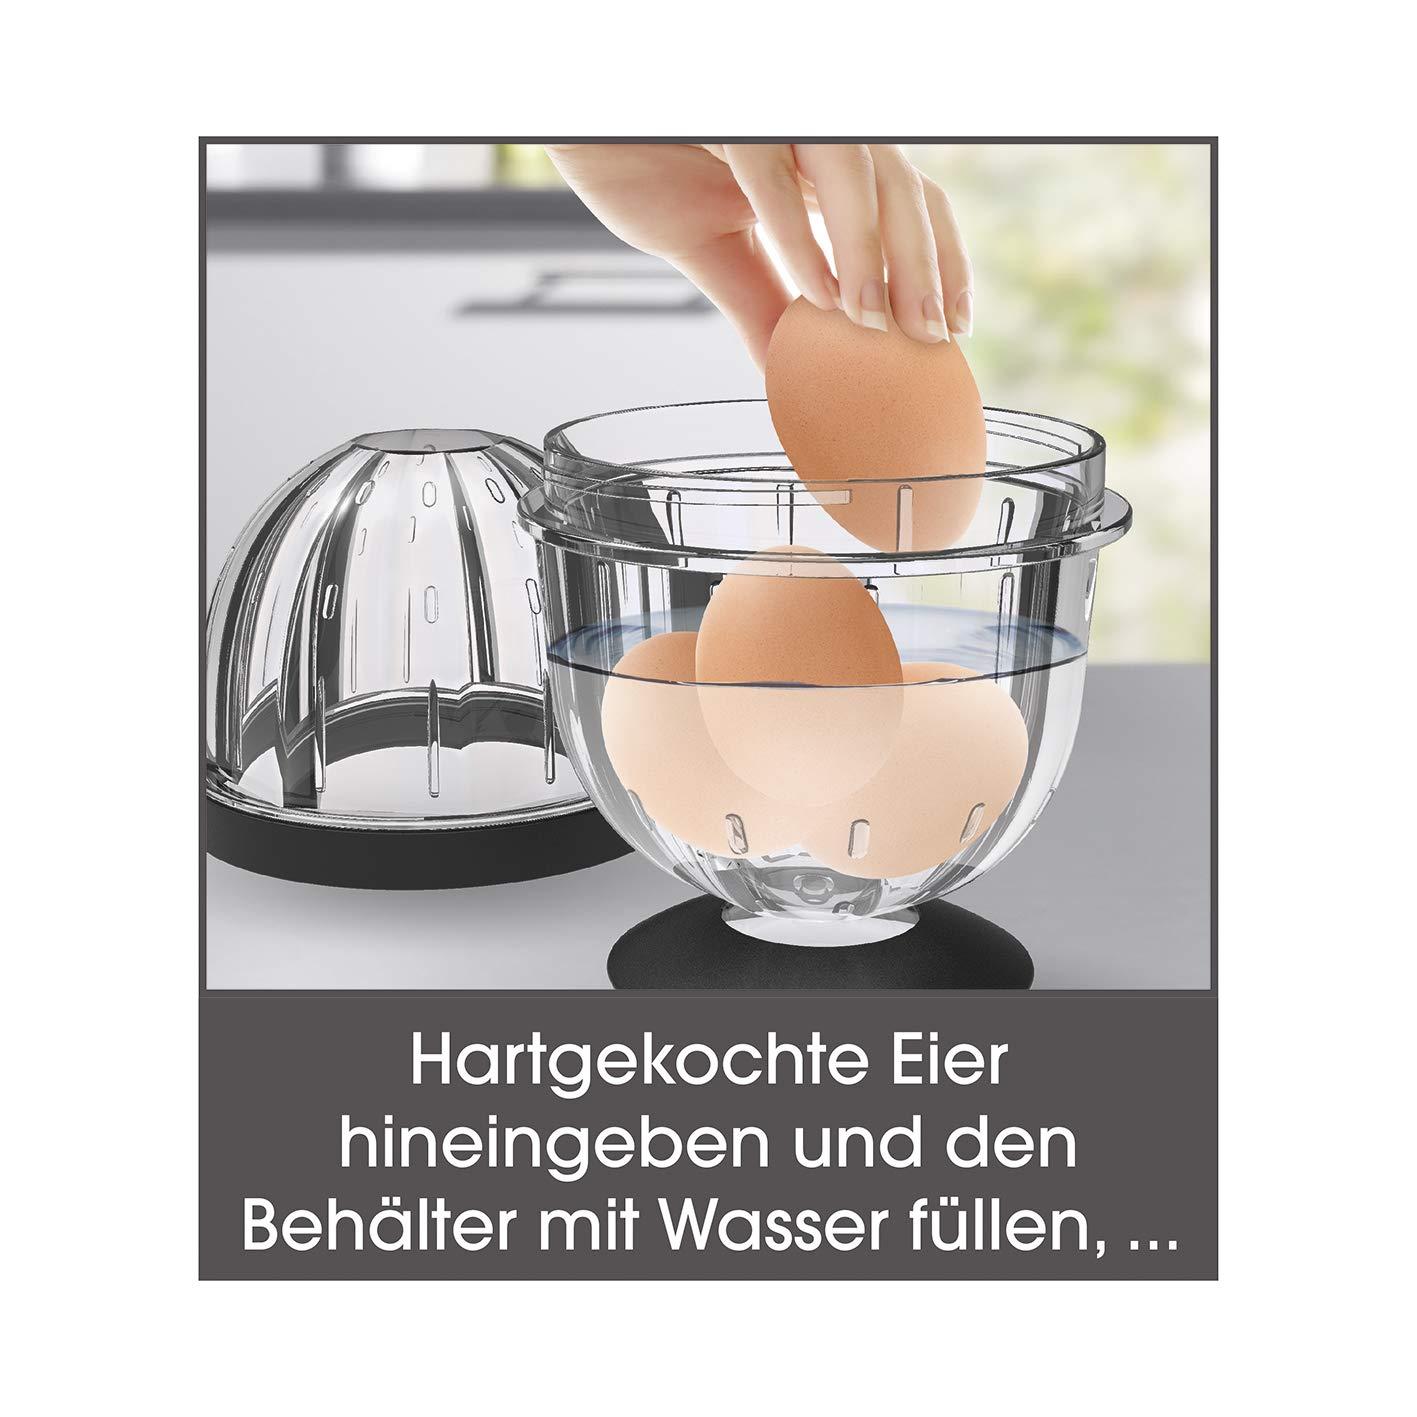 Extrem schnell sch/älen durch Sch/ütteln GOURMETmaxx Eiersch/äler Bis zu 5 Eier aufeinmal